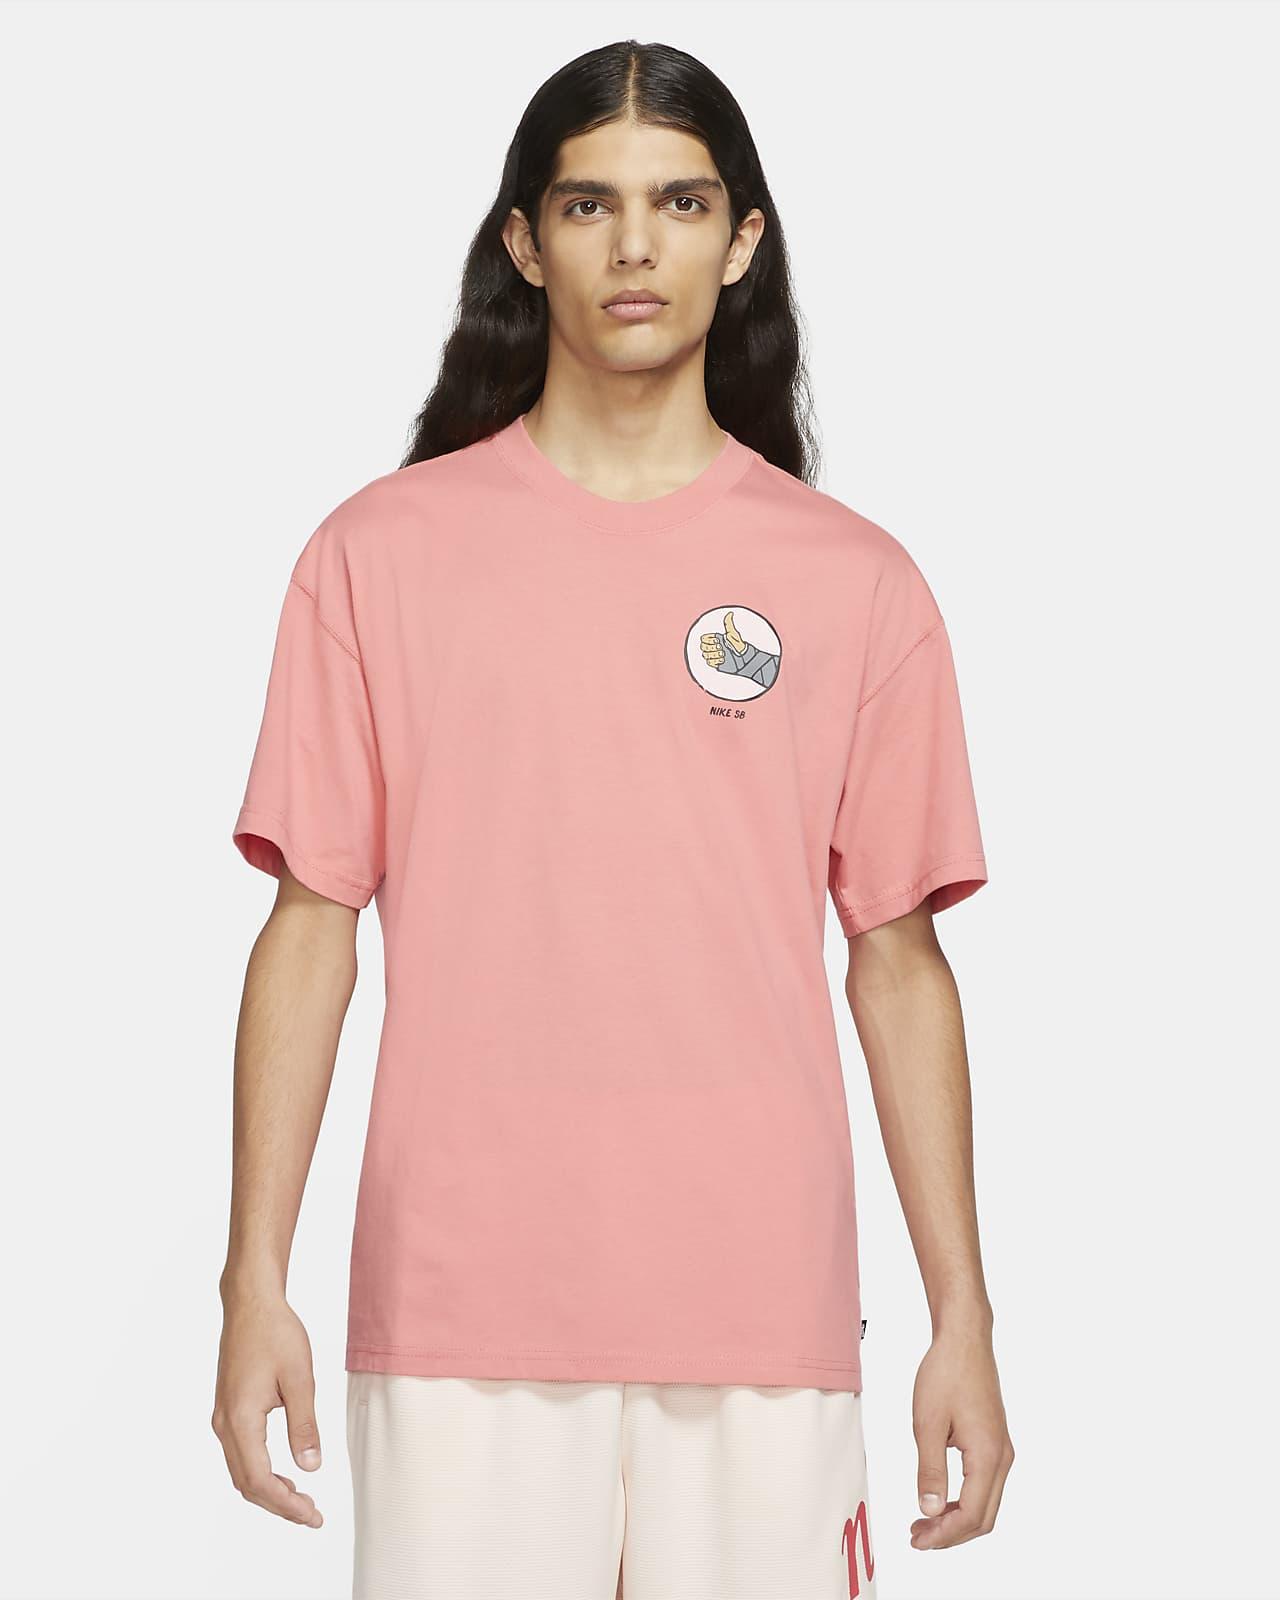 Tee-shirt de skateboard Nike SB pour Homme